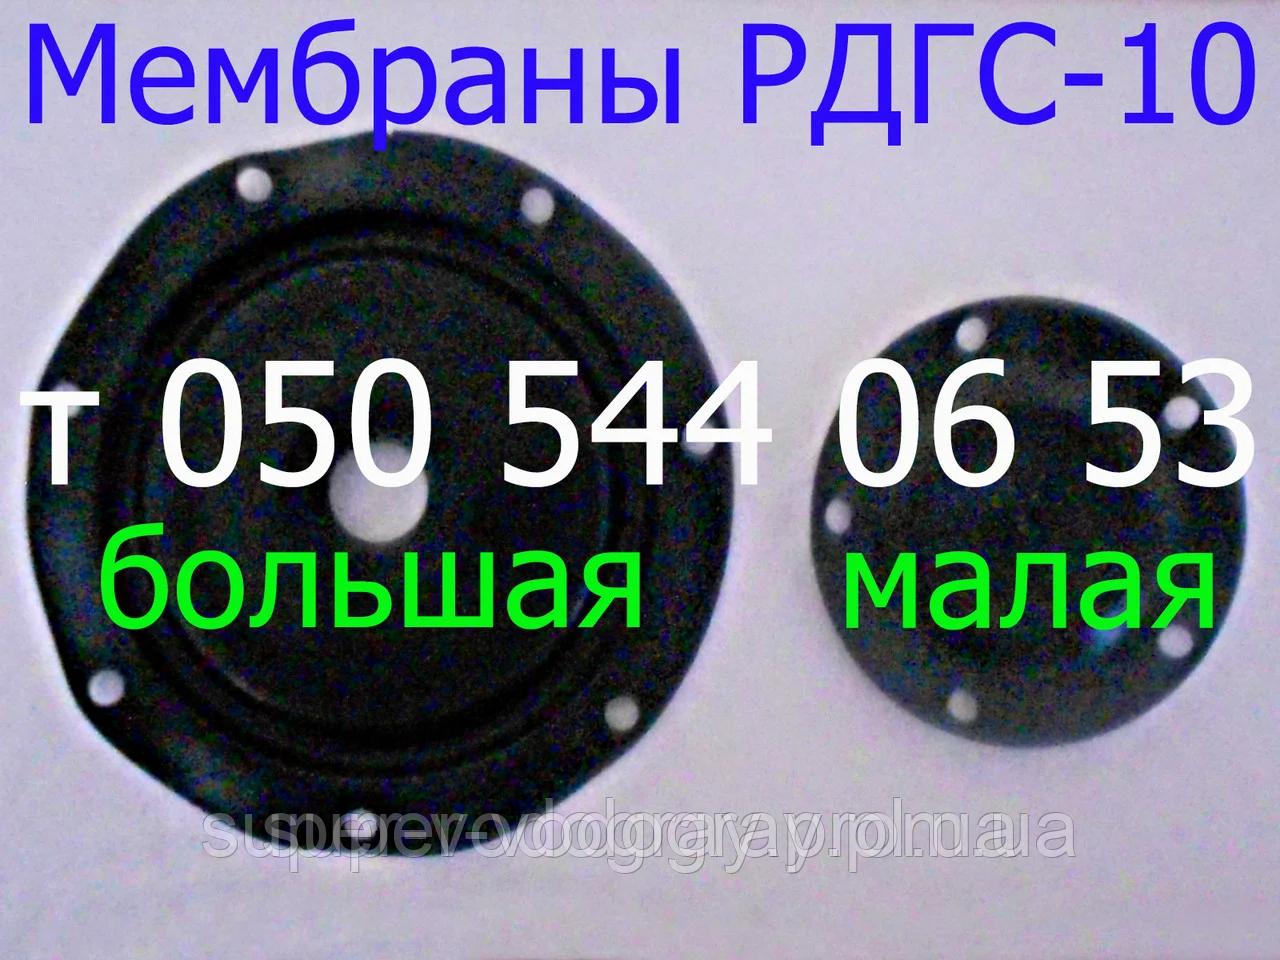 Мембрана для регулятора газа РДГС-10